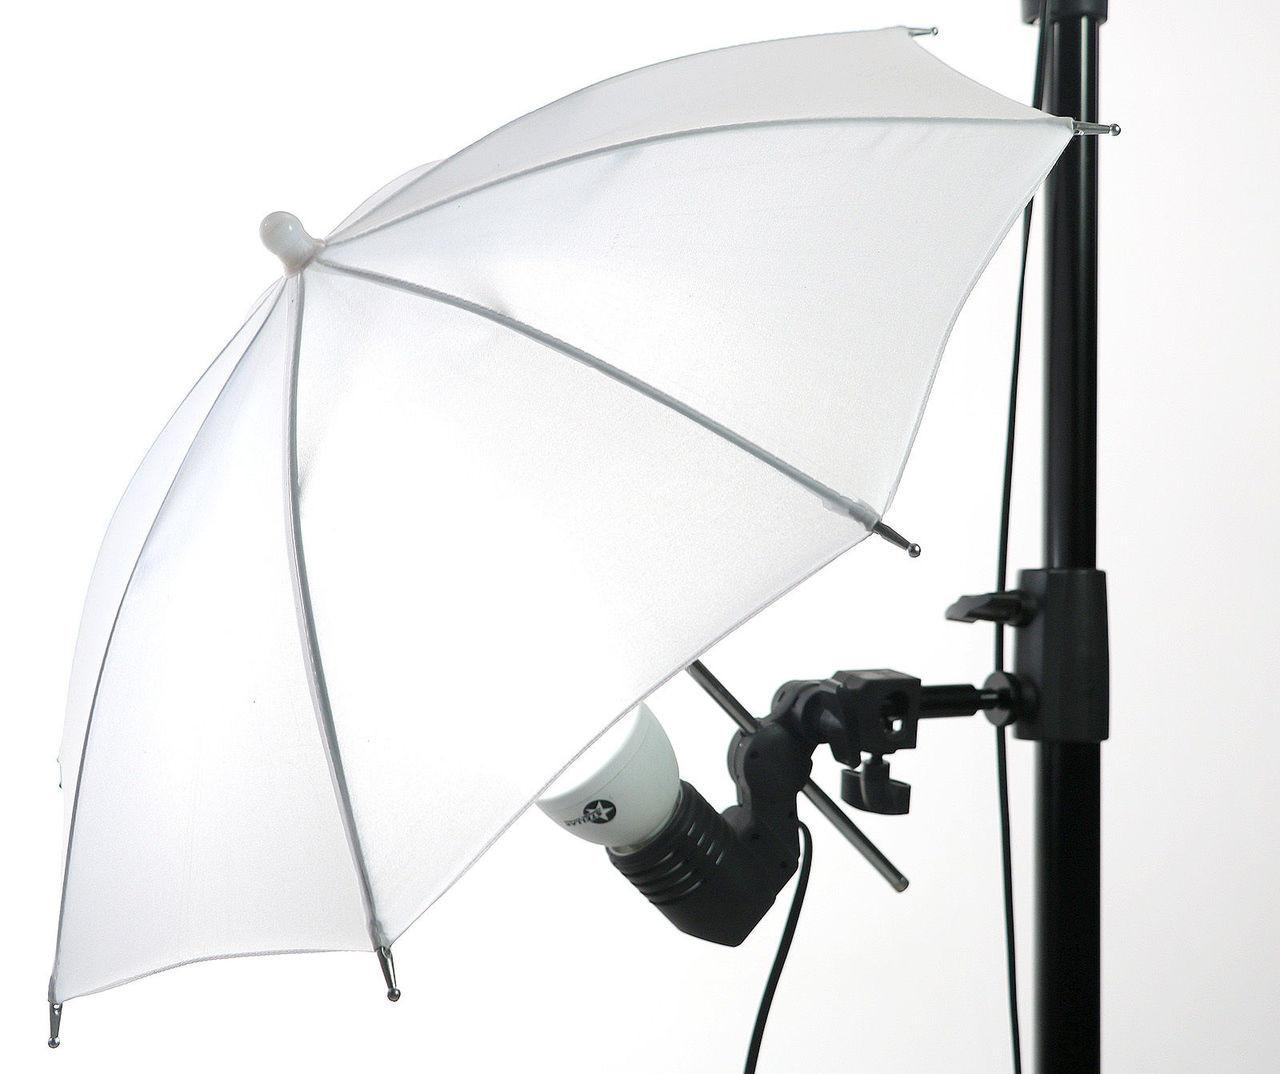 Stellar Venus, a broadcast tool